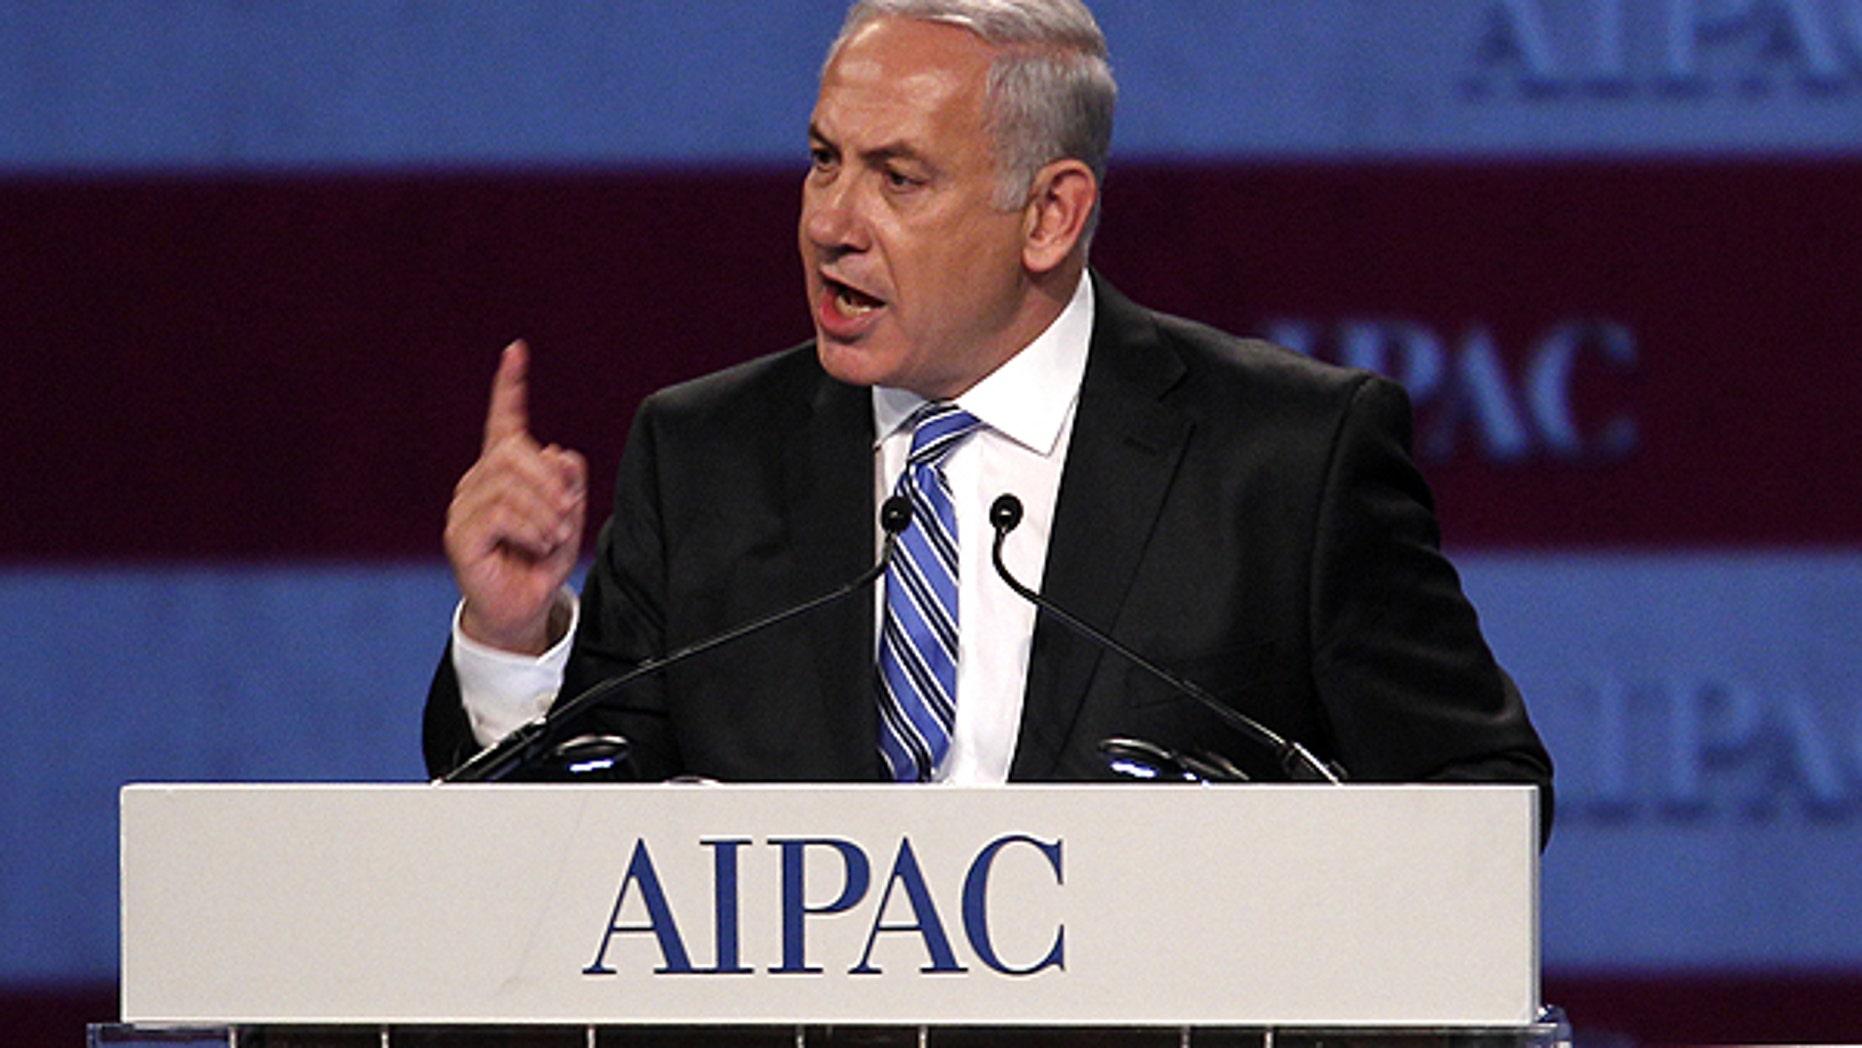 May 23: Israel Prime Minister Benjamin Netanyahu speaks at the American Israel Public Affairs Committee meeting in Washington.